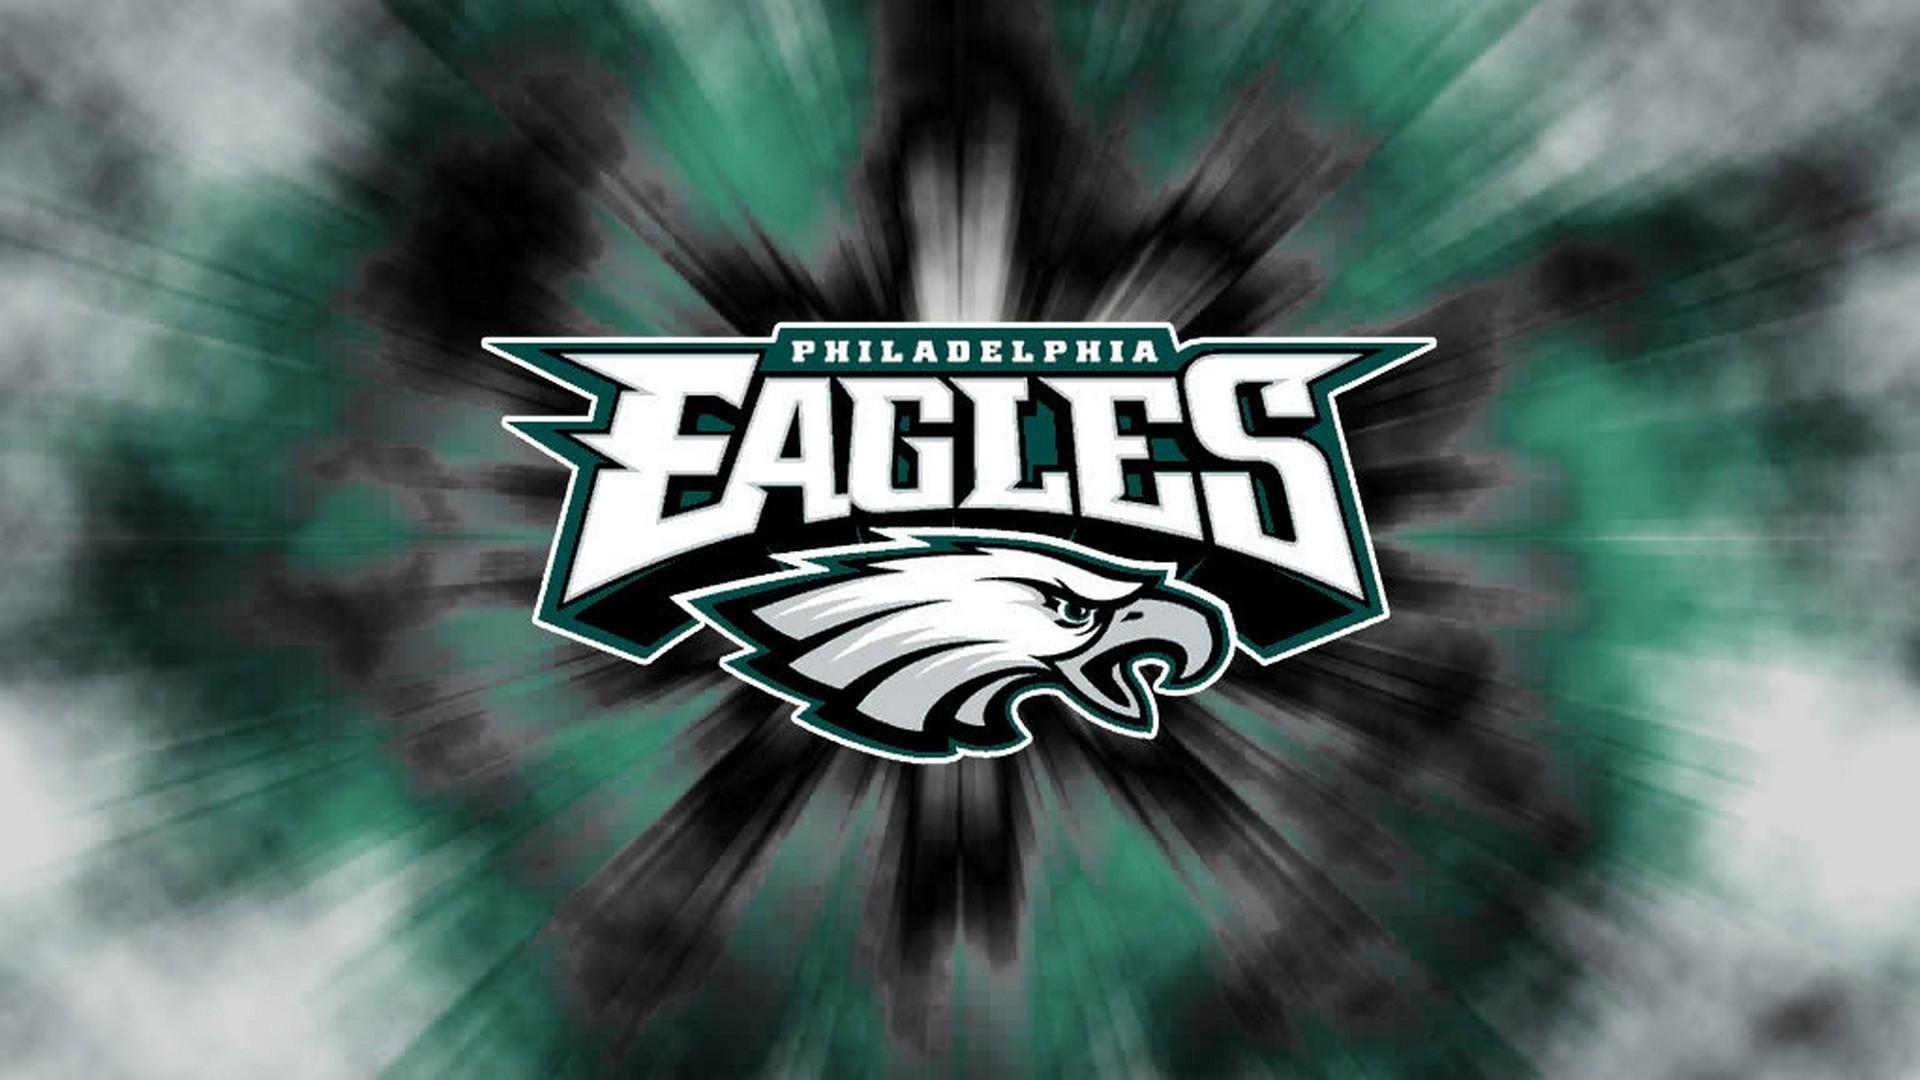 Philadelphia Eagles PC Wallpaper HD